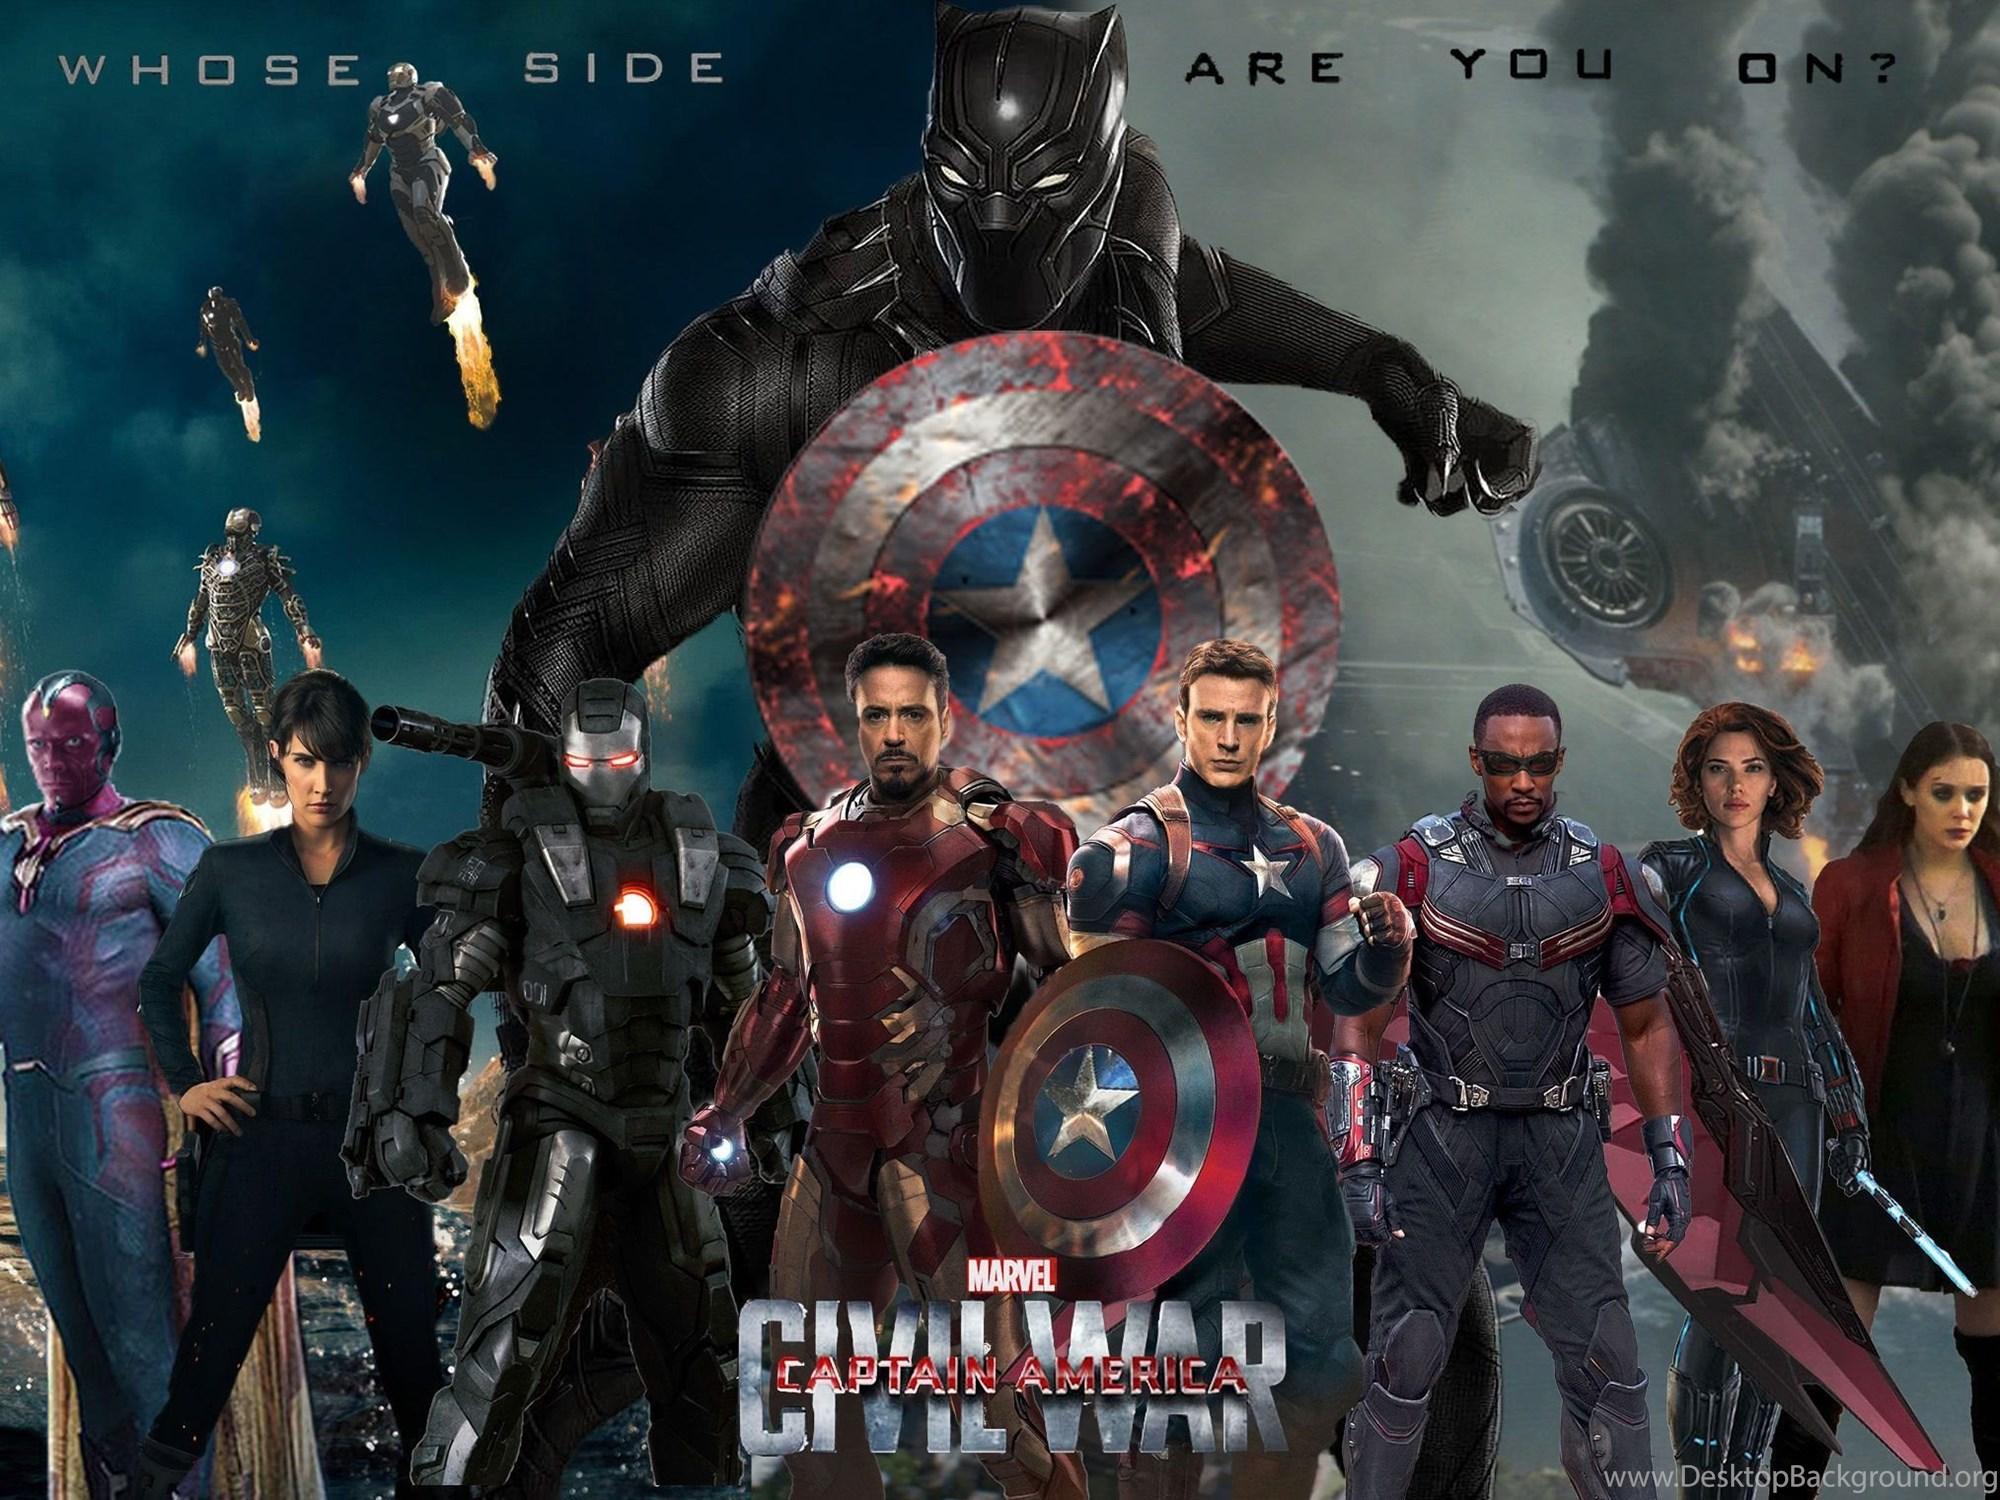 Captain America Civil War 2016 High Resolution Image Desktop Background